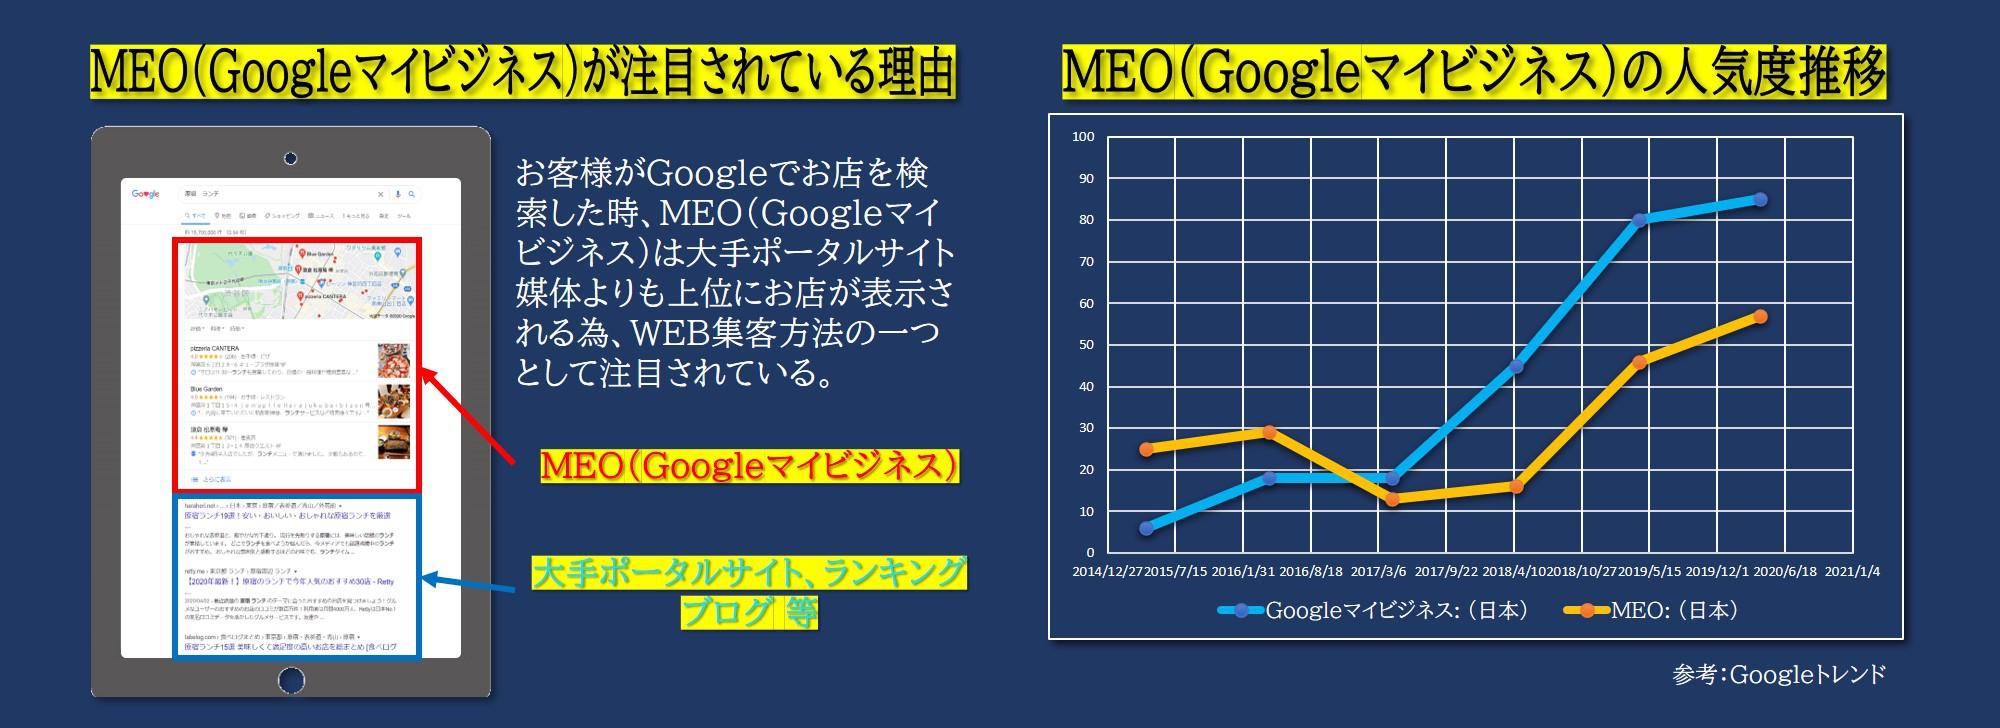 Ⅱ.MEO(Googleマイビジネス)が注目されている理由